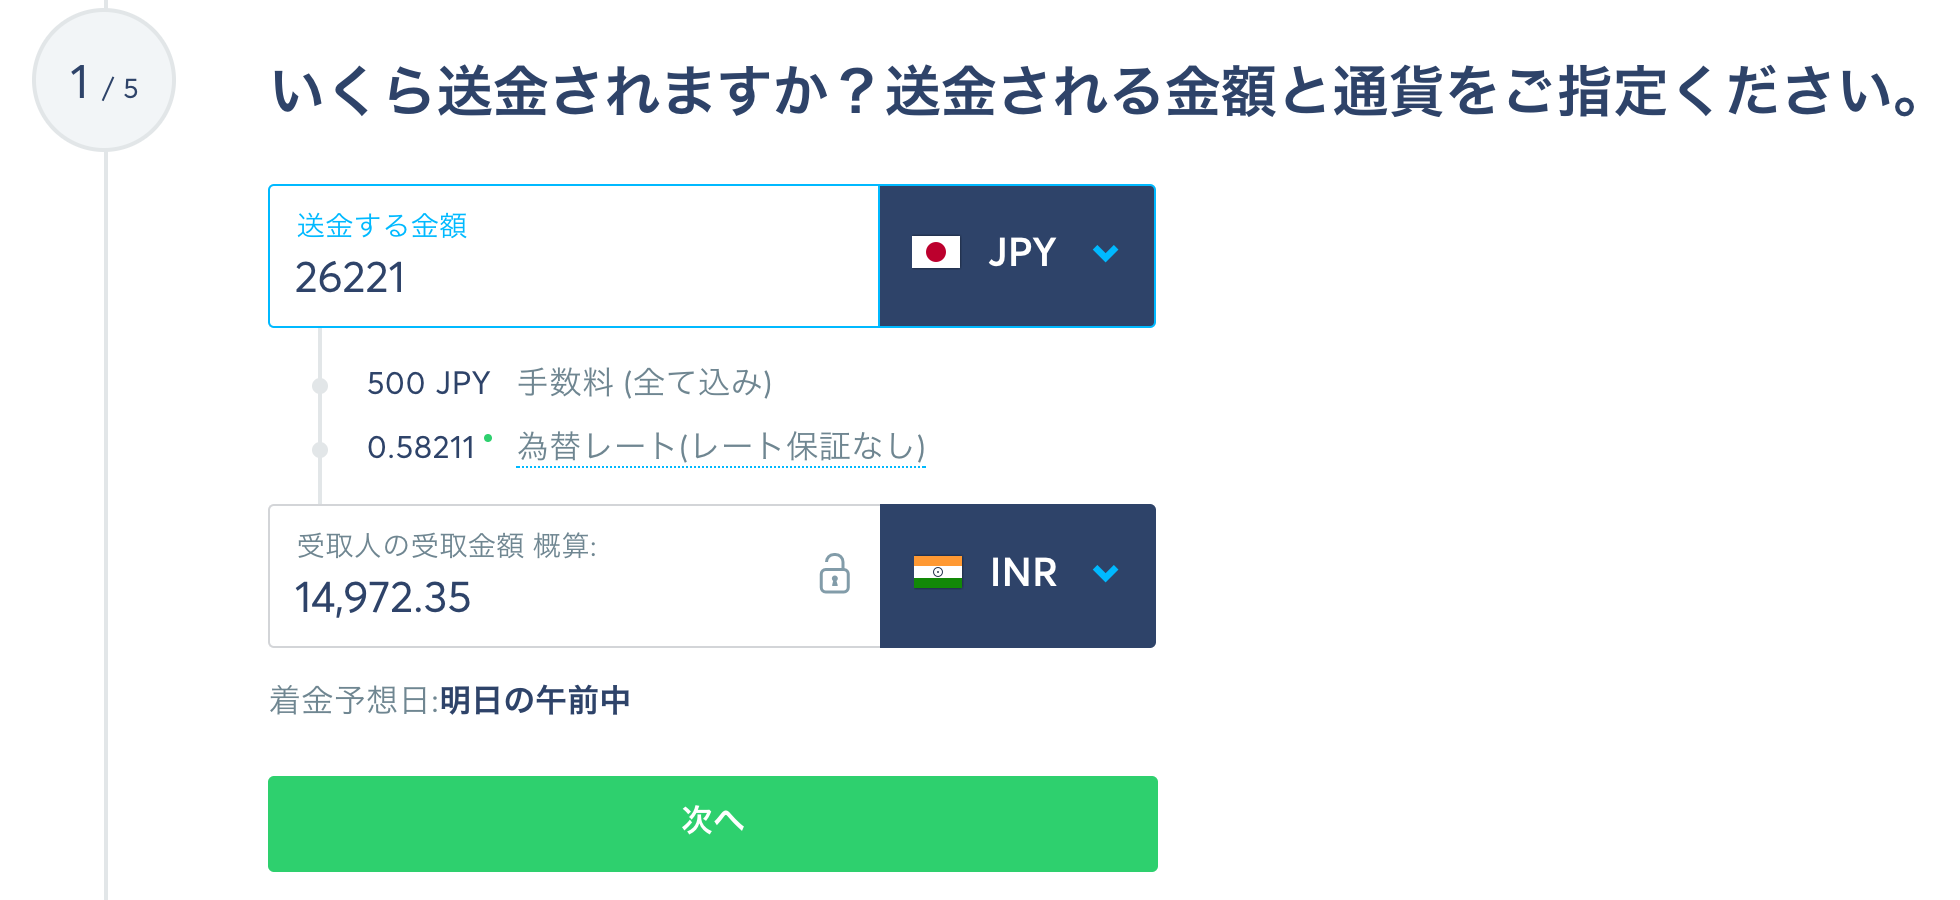 Transferwiseの送金金額入力画面、日本円とインドルピー